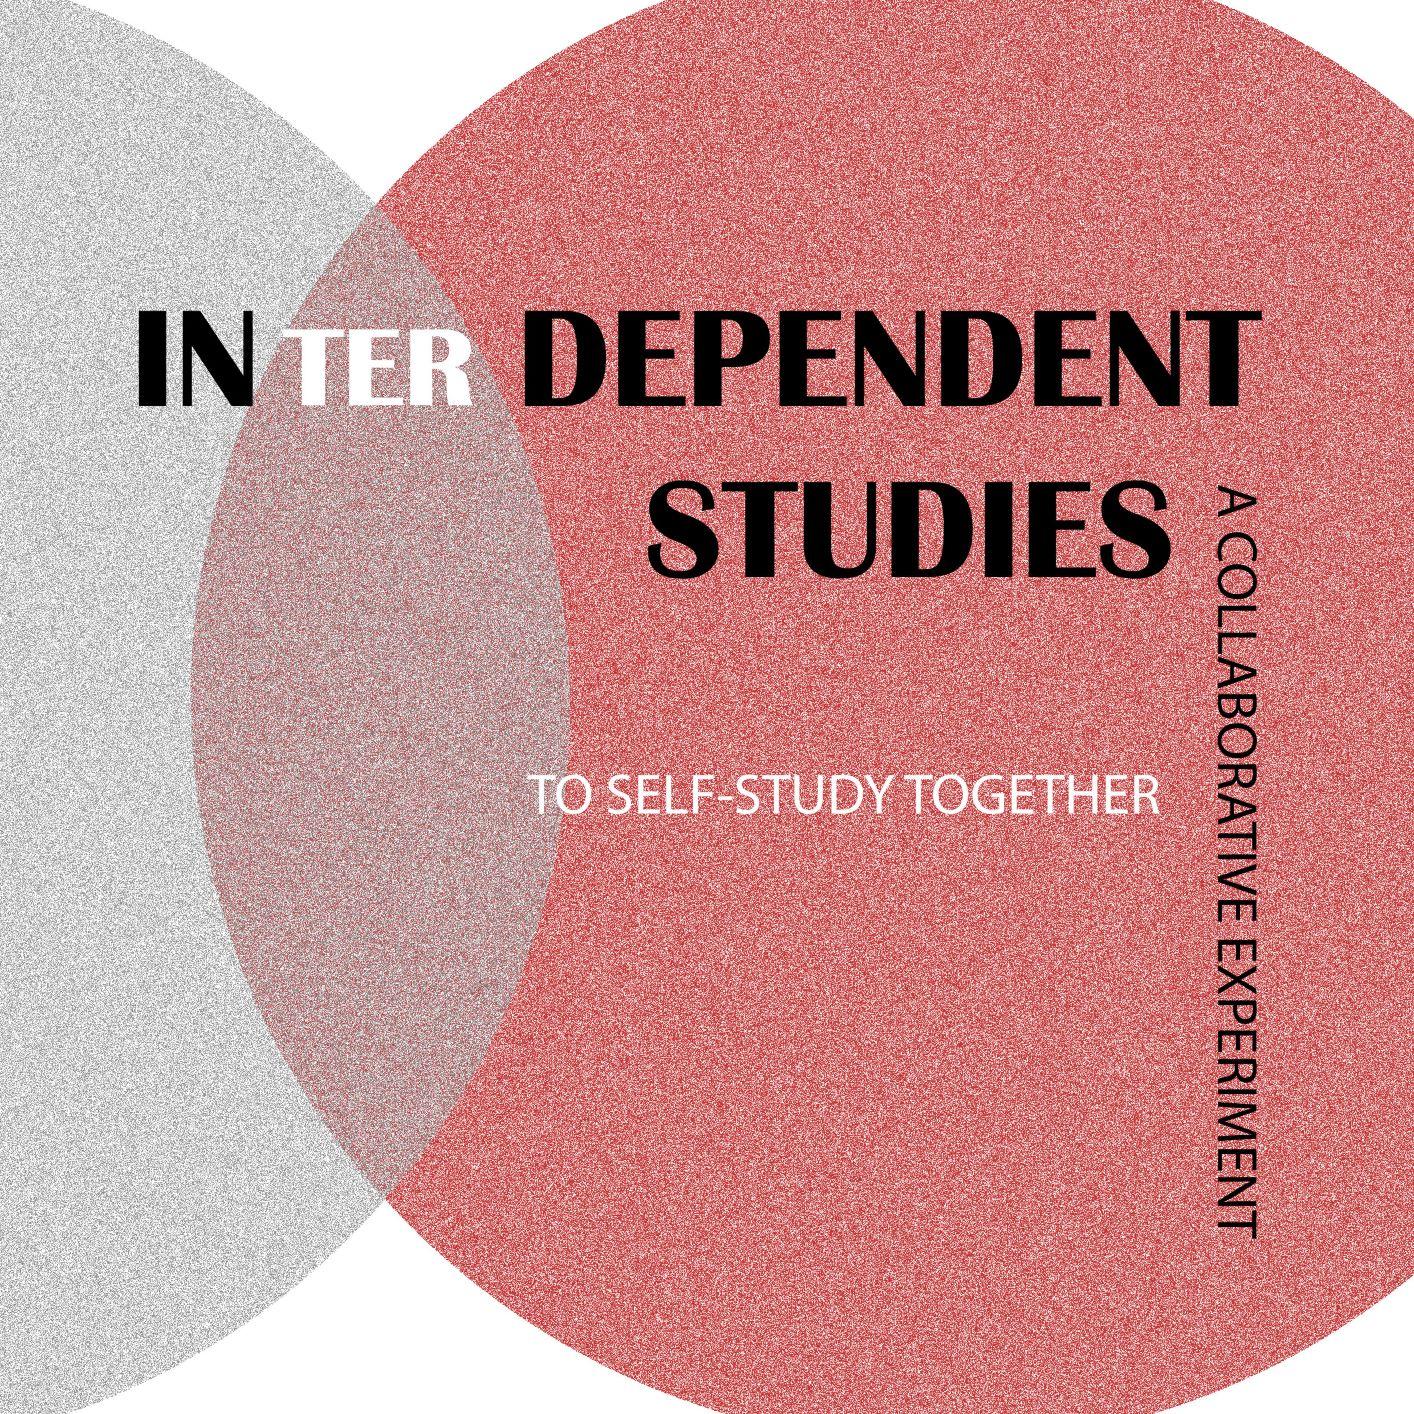 interdependent 2mb.jpg